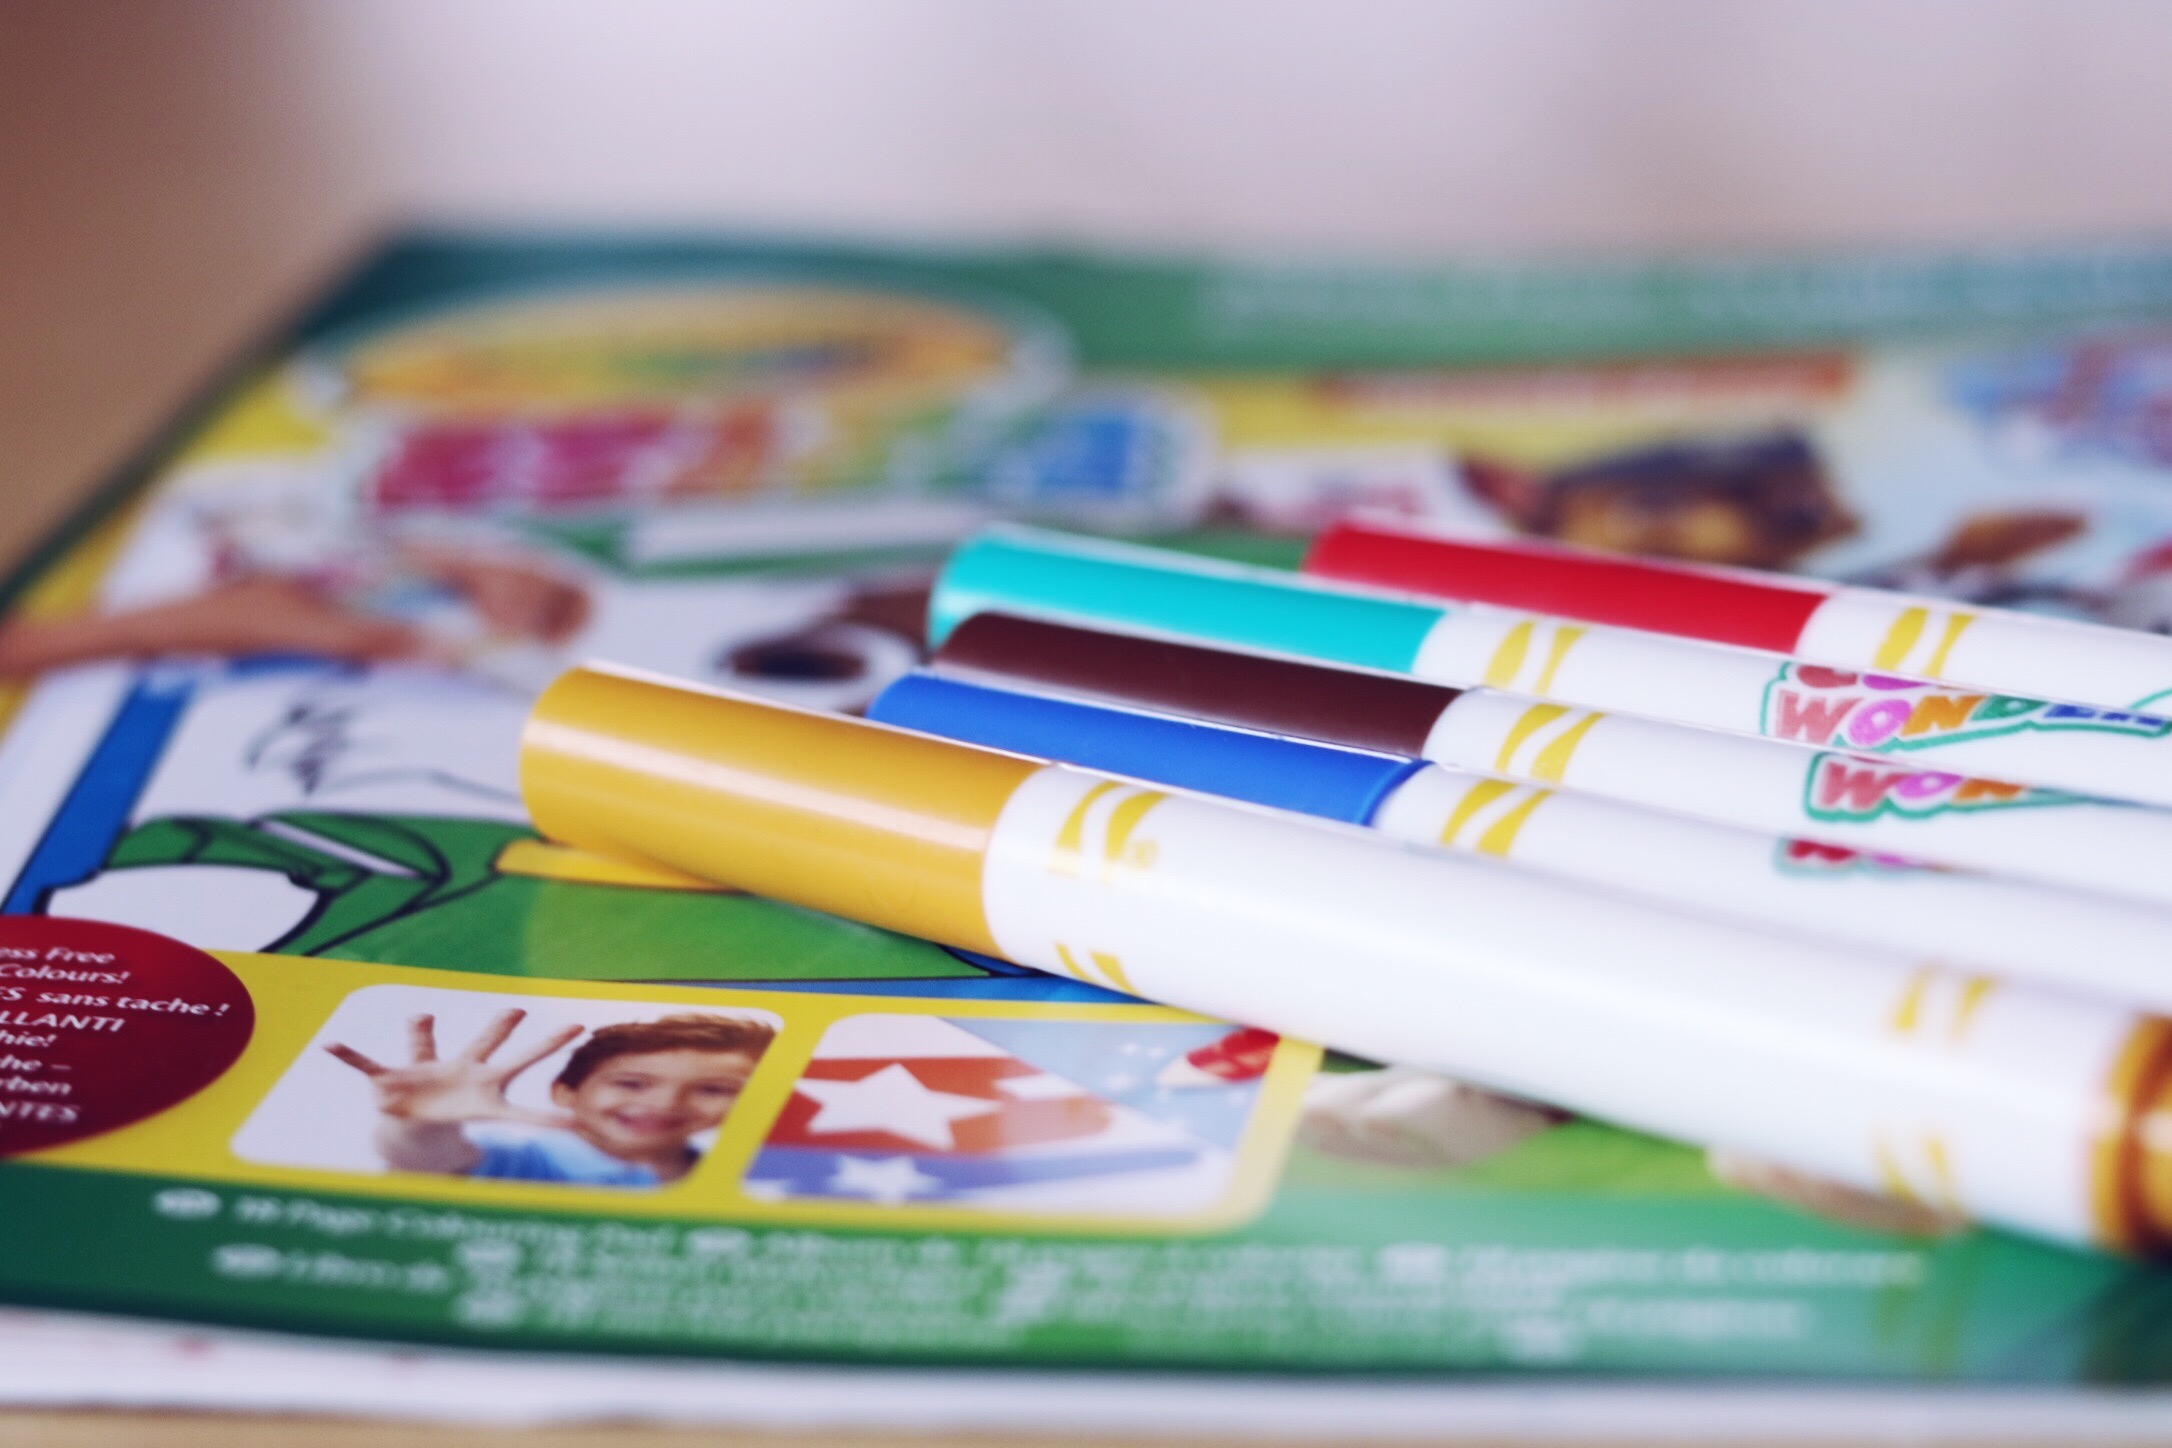 color wonder crayola feutres thereseandthekids